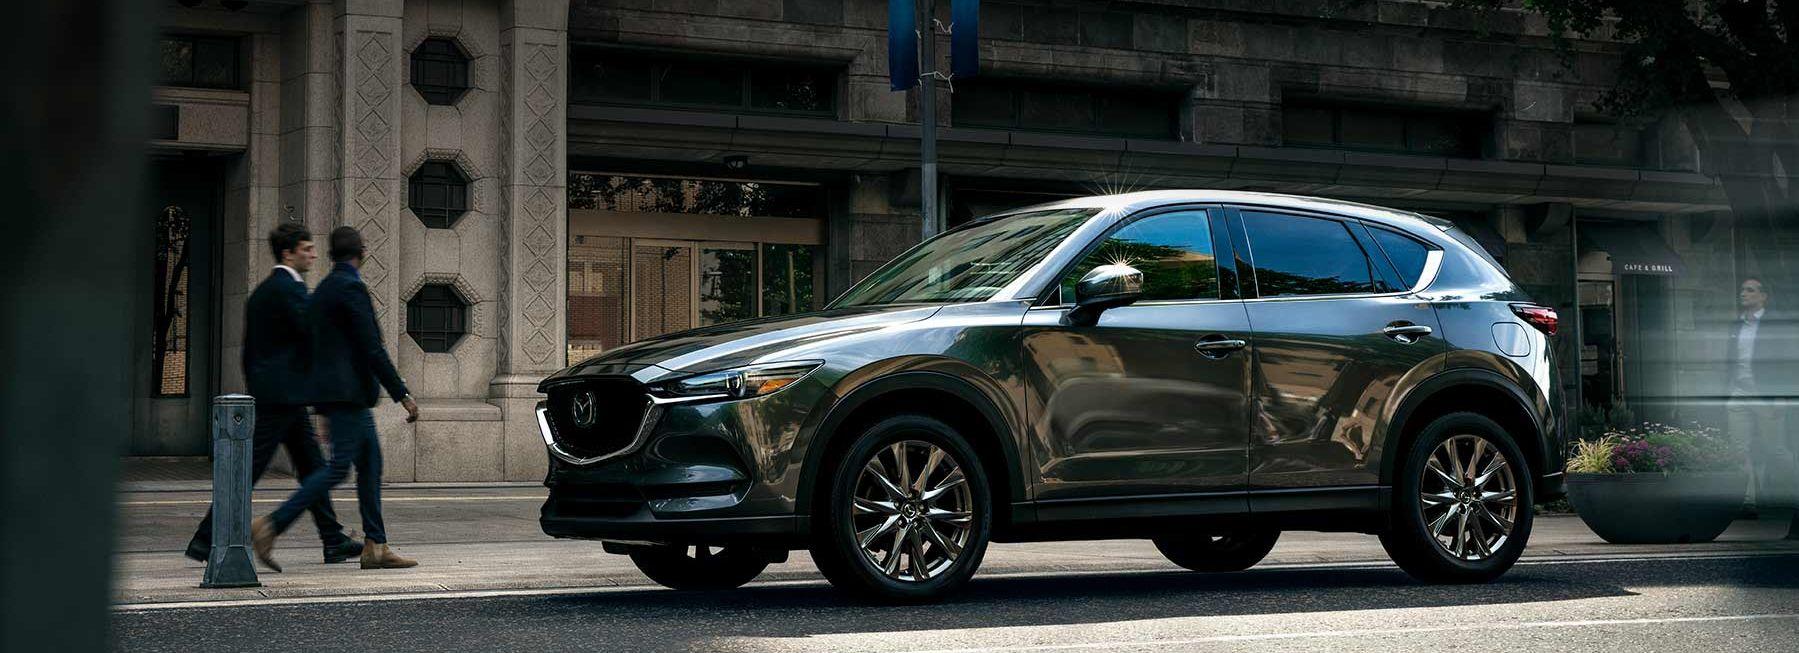 2019 Mazda CX-5 Financing near Fountain Valley, CA